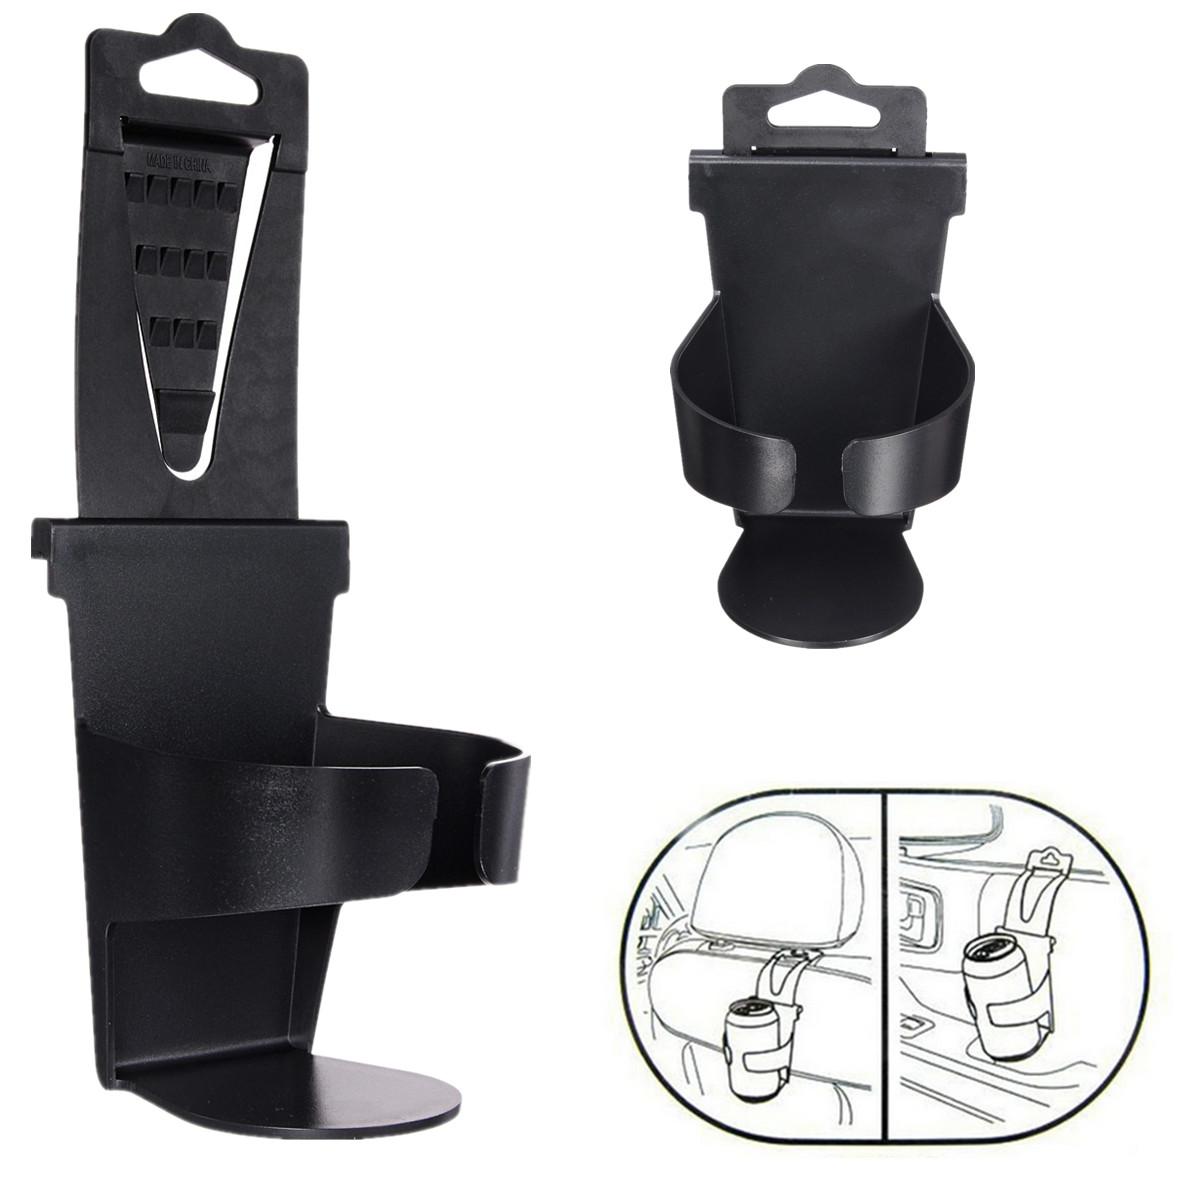 Universal Vehicle Car Truck Door Mount Drinks Bottle Cup Holder Stand Black